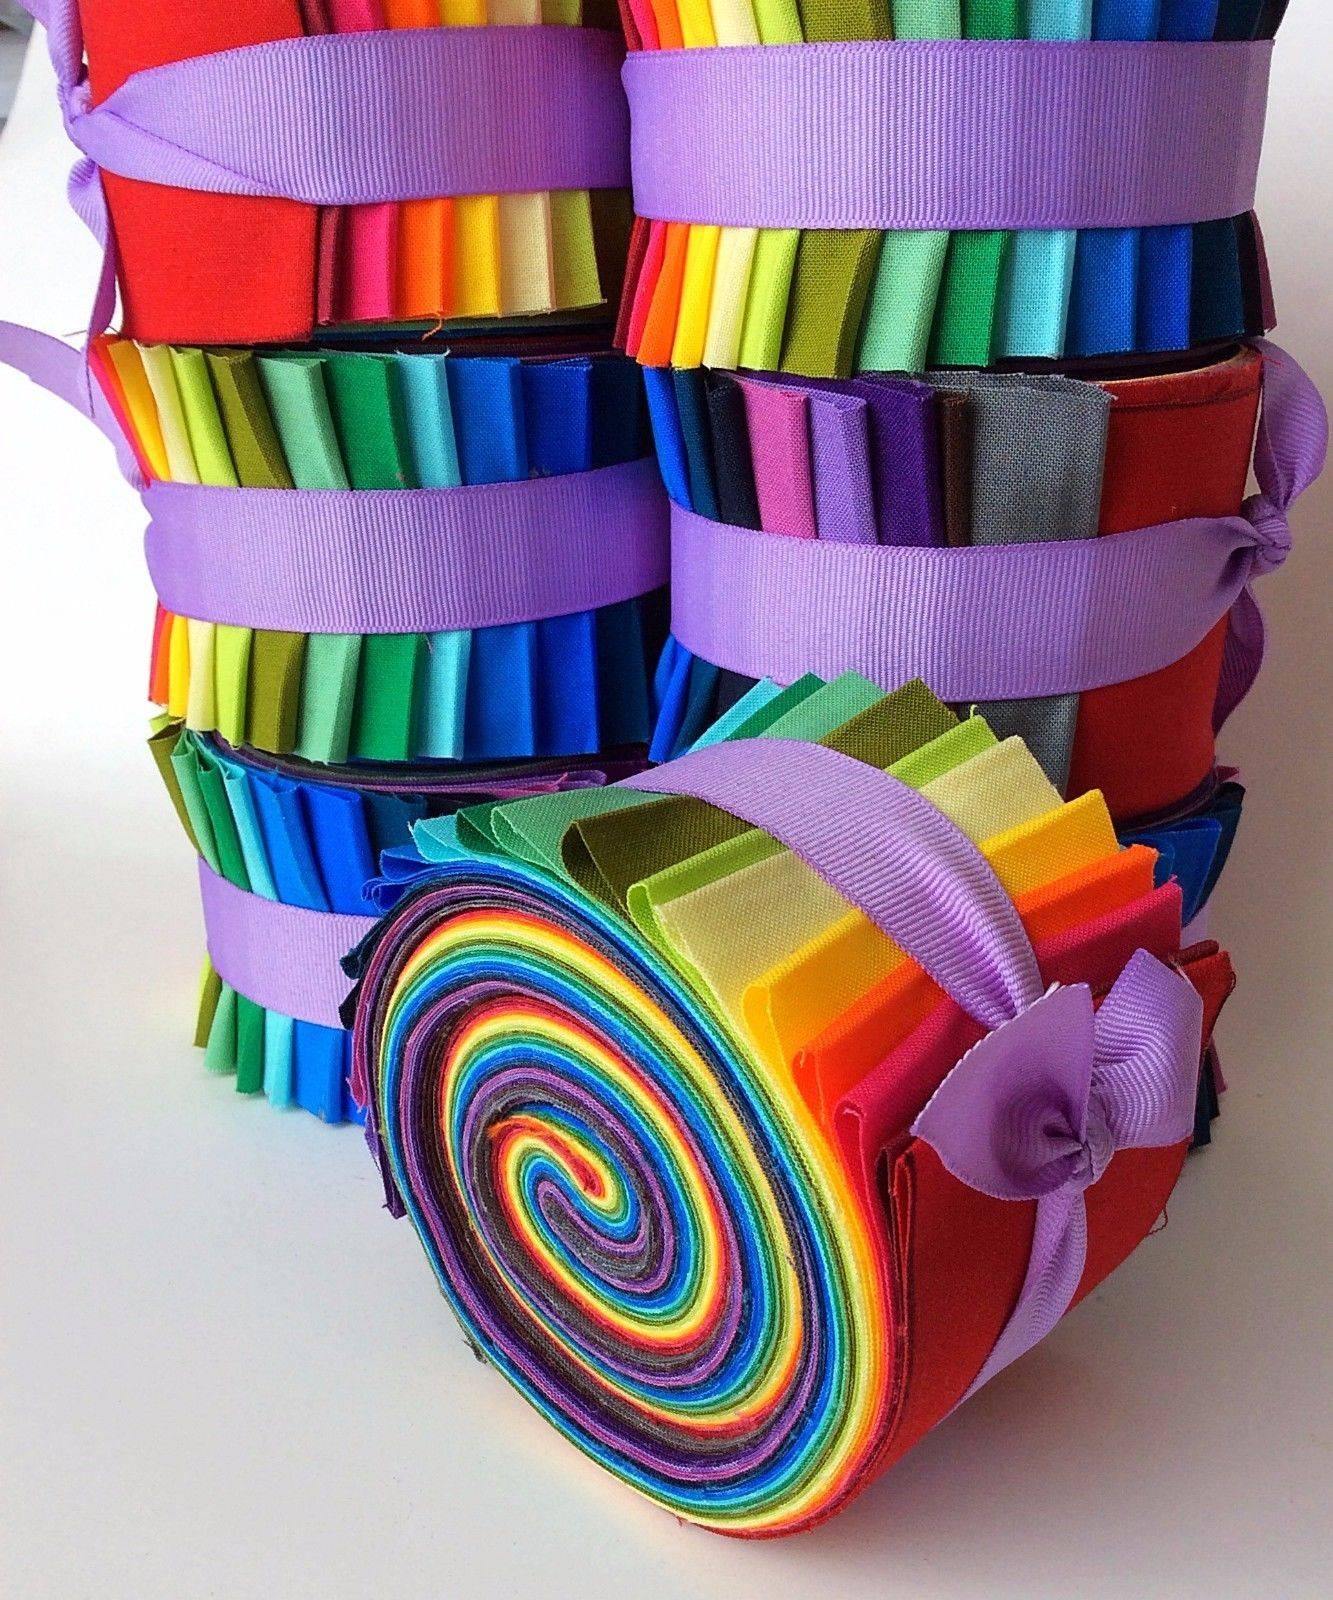 25 Inch Rainbow Jelly Roll Fabric Quilting Strips Moda